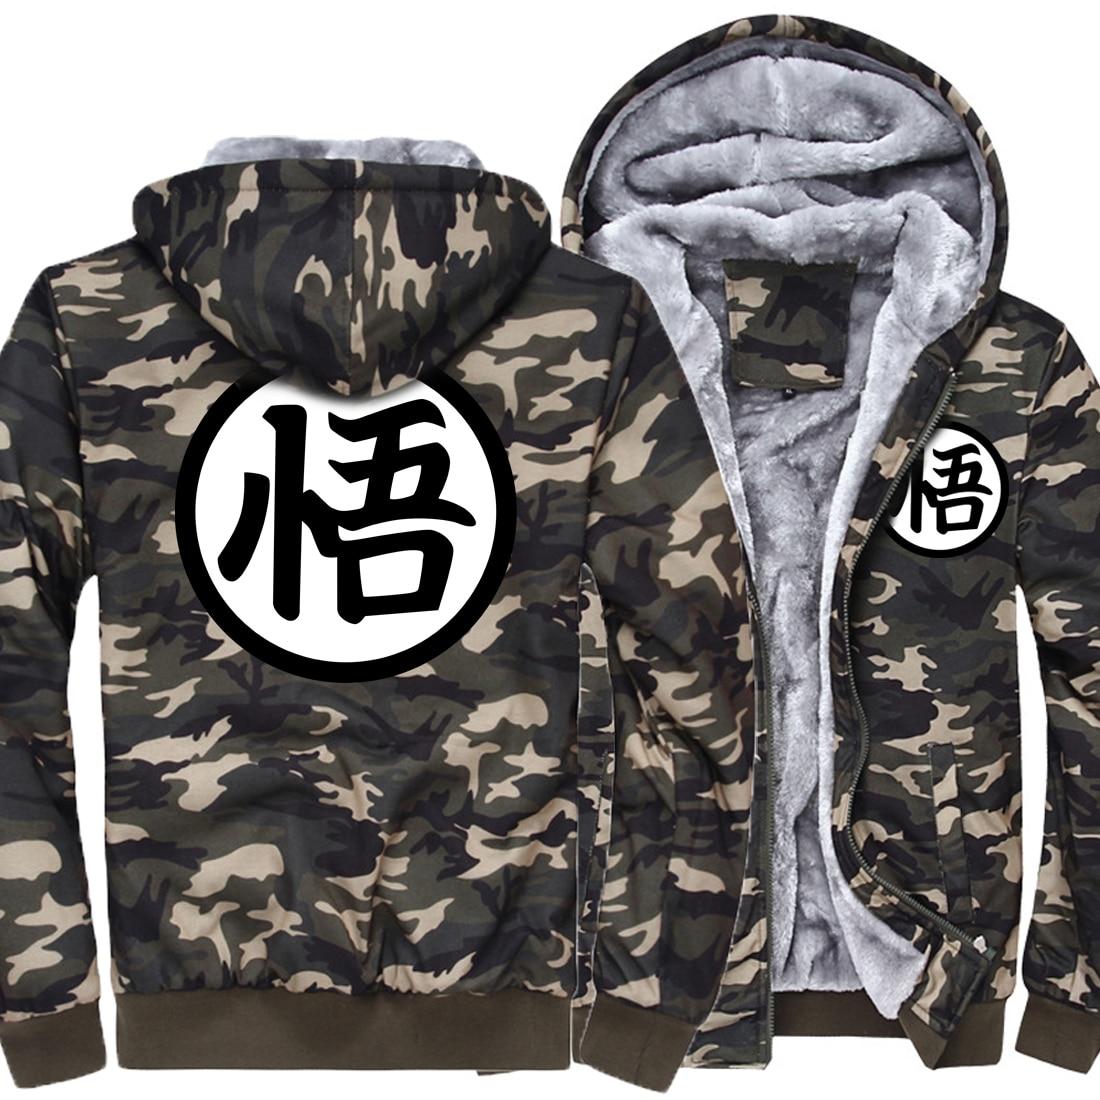 2019 Men Fashion Camouflage Thick Winter Hoodies Anime Dragon Ball print Son Goku Streetwear Hipster Men's Sportswear Hoody Kpop